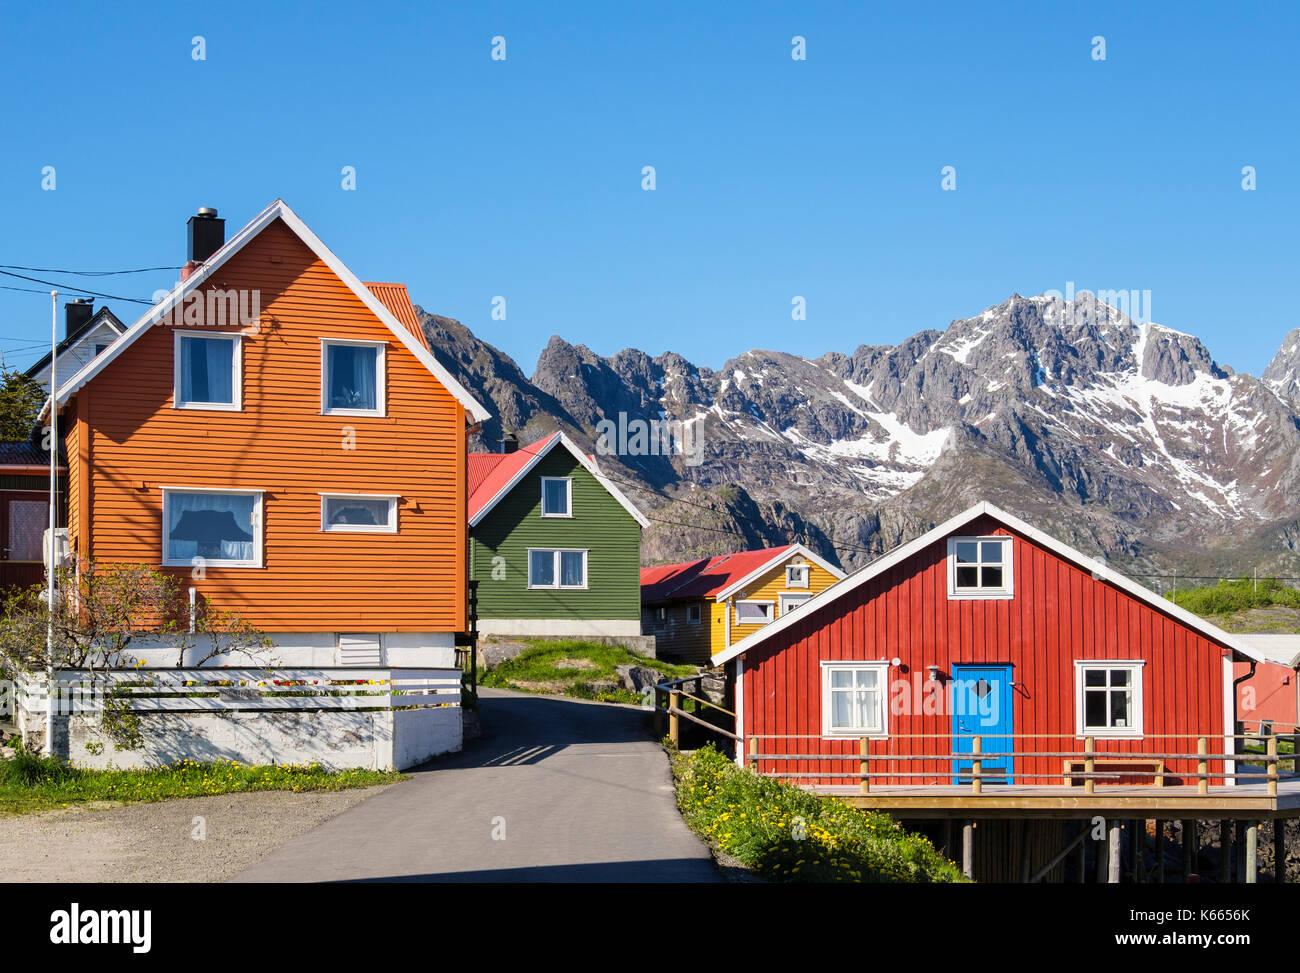 Typischen bunten Norwegische Architektur Holzhäuser in Henningsvær, Austvågøya Insel, Lofoten, Nordland, Norwegen, Skandinavien Stockbild